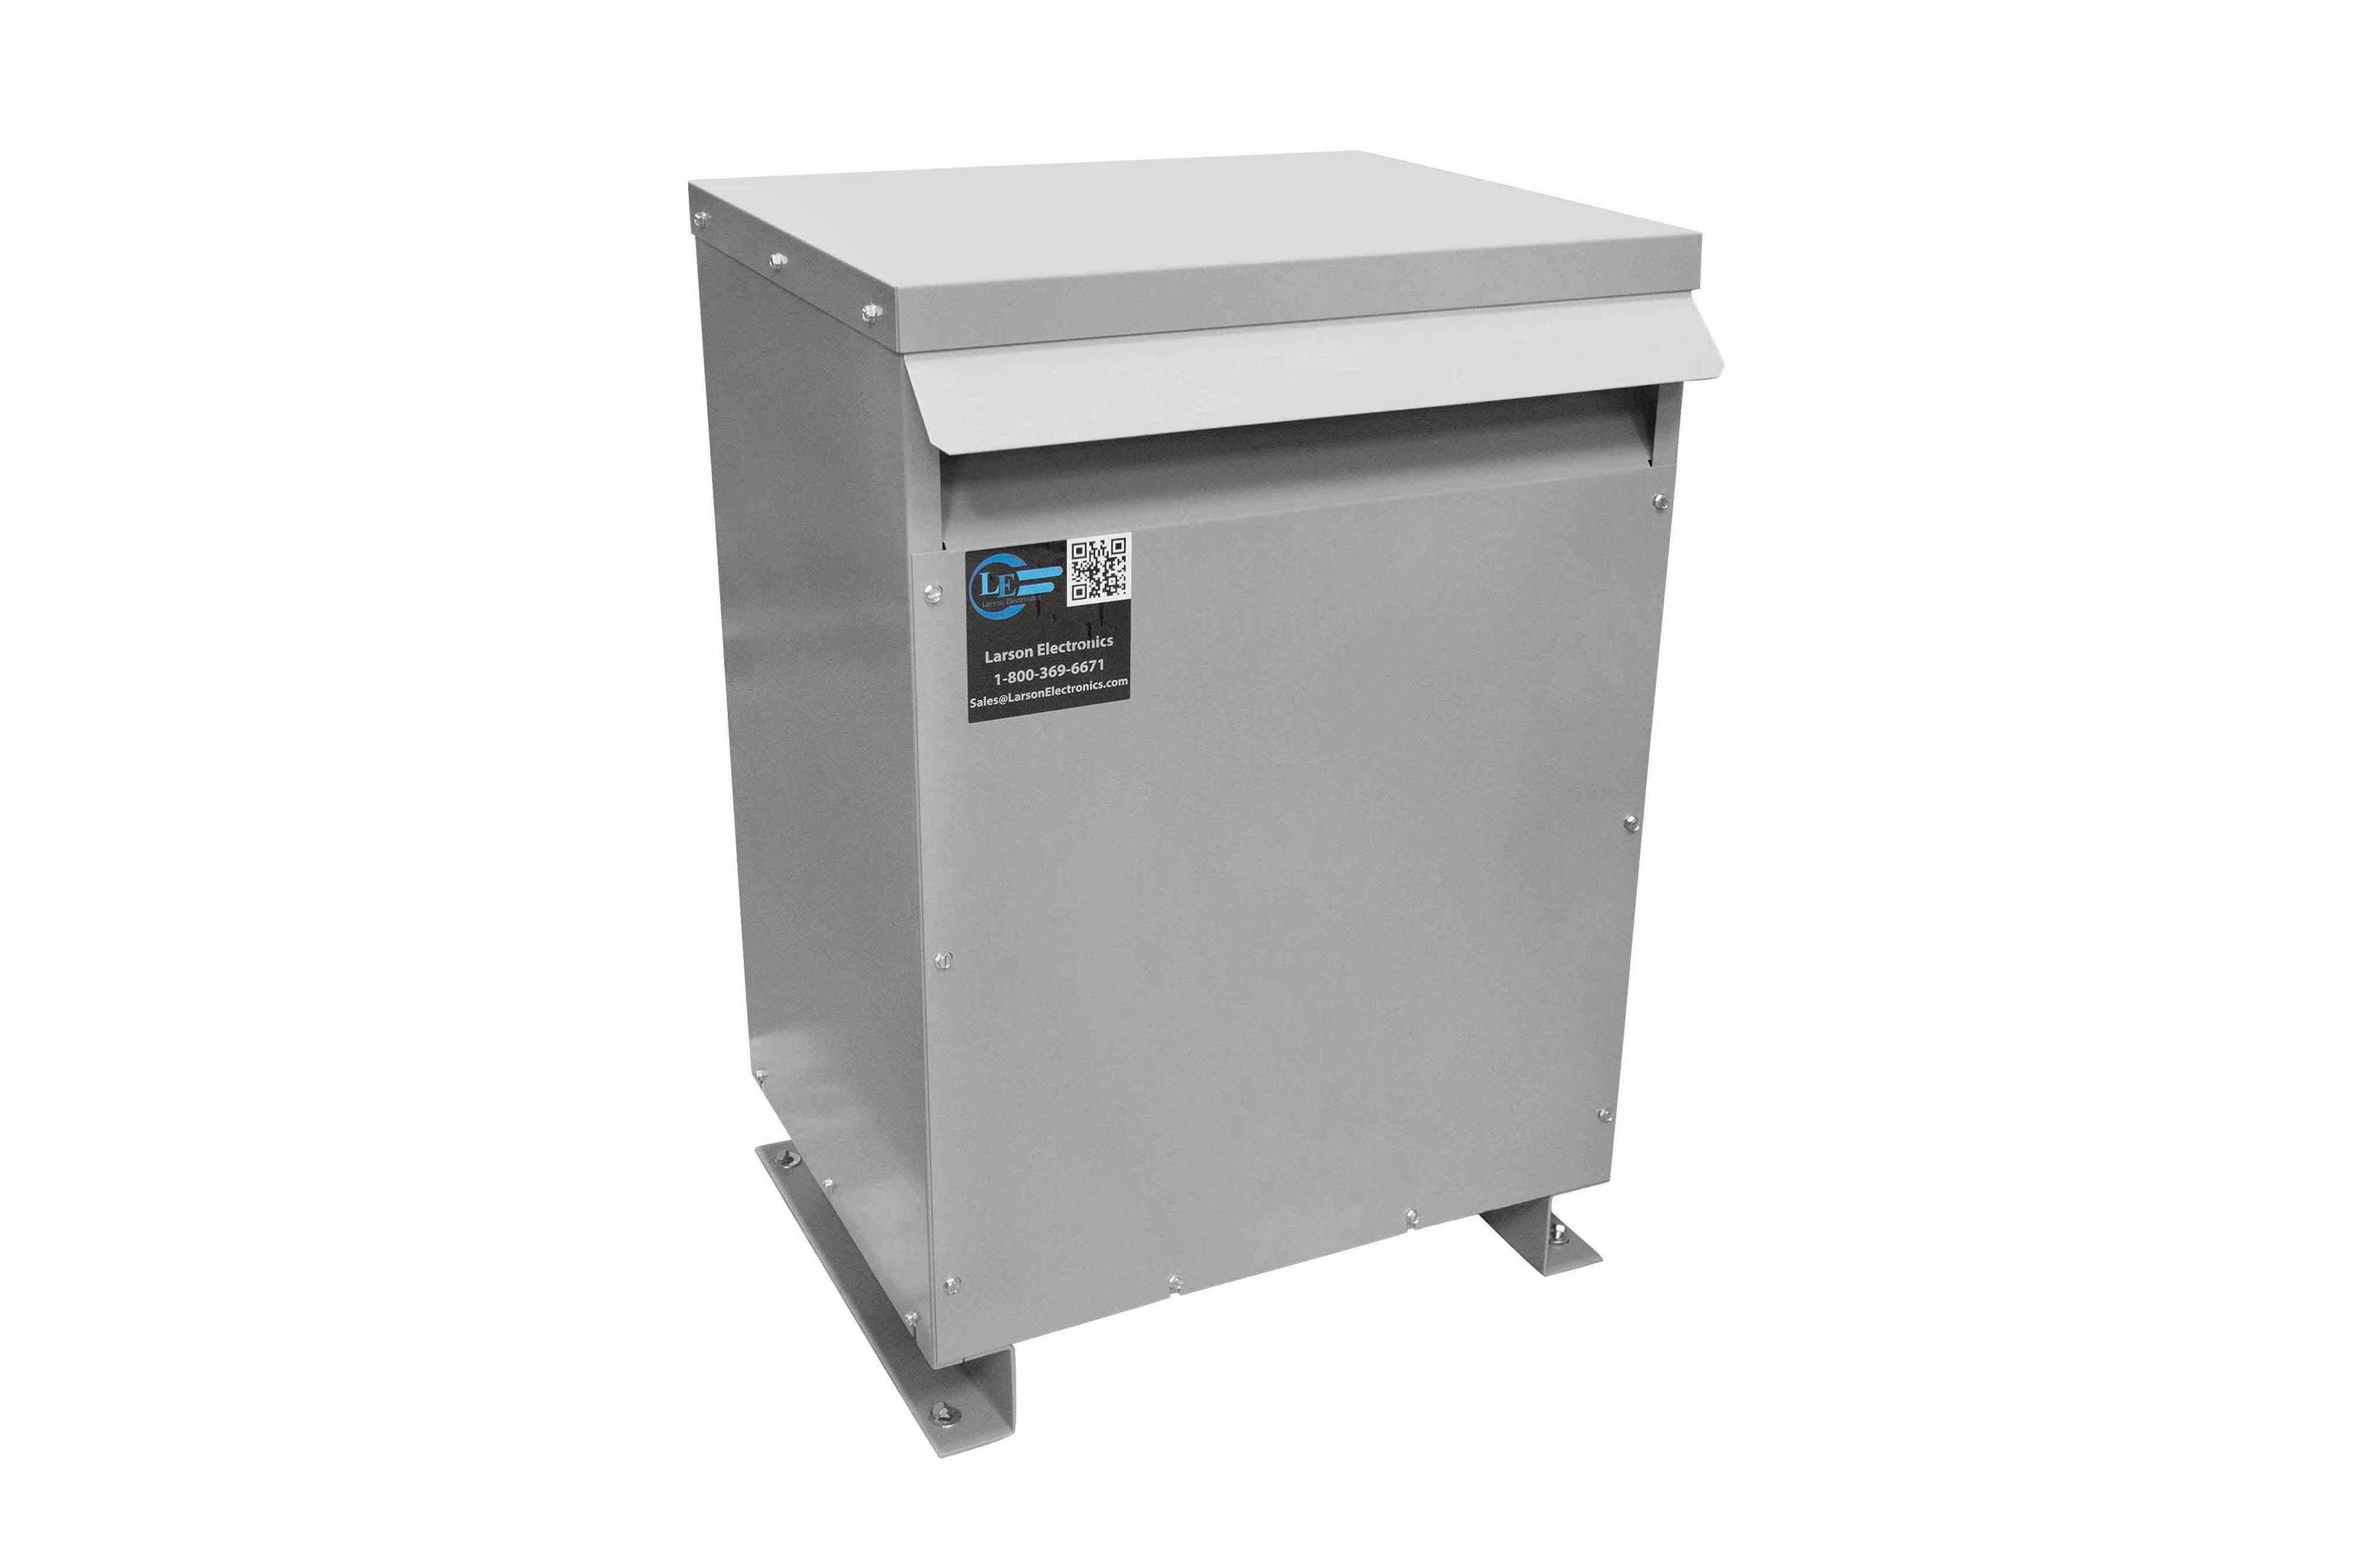 55 kVA 3PH Isolation Transformer, 575V Wye Primary, 480V Delta Secondary, N3R, Ventilated, 60 Hz